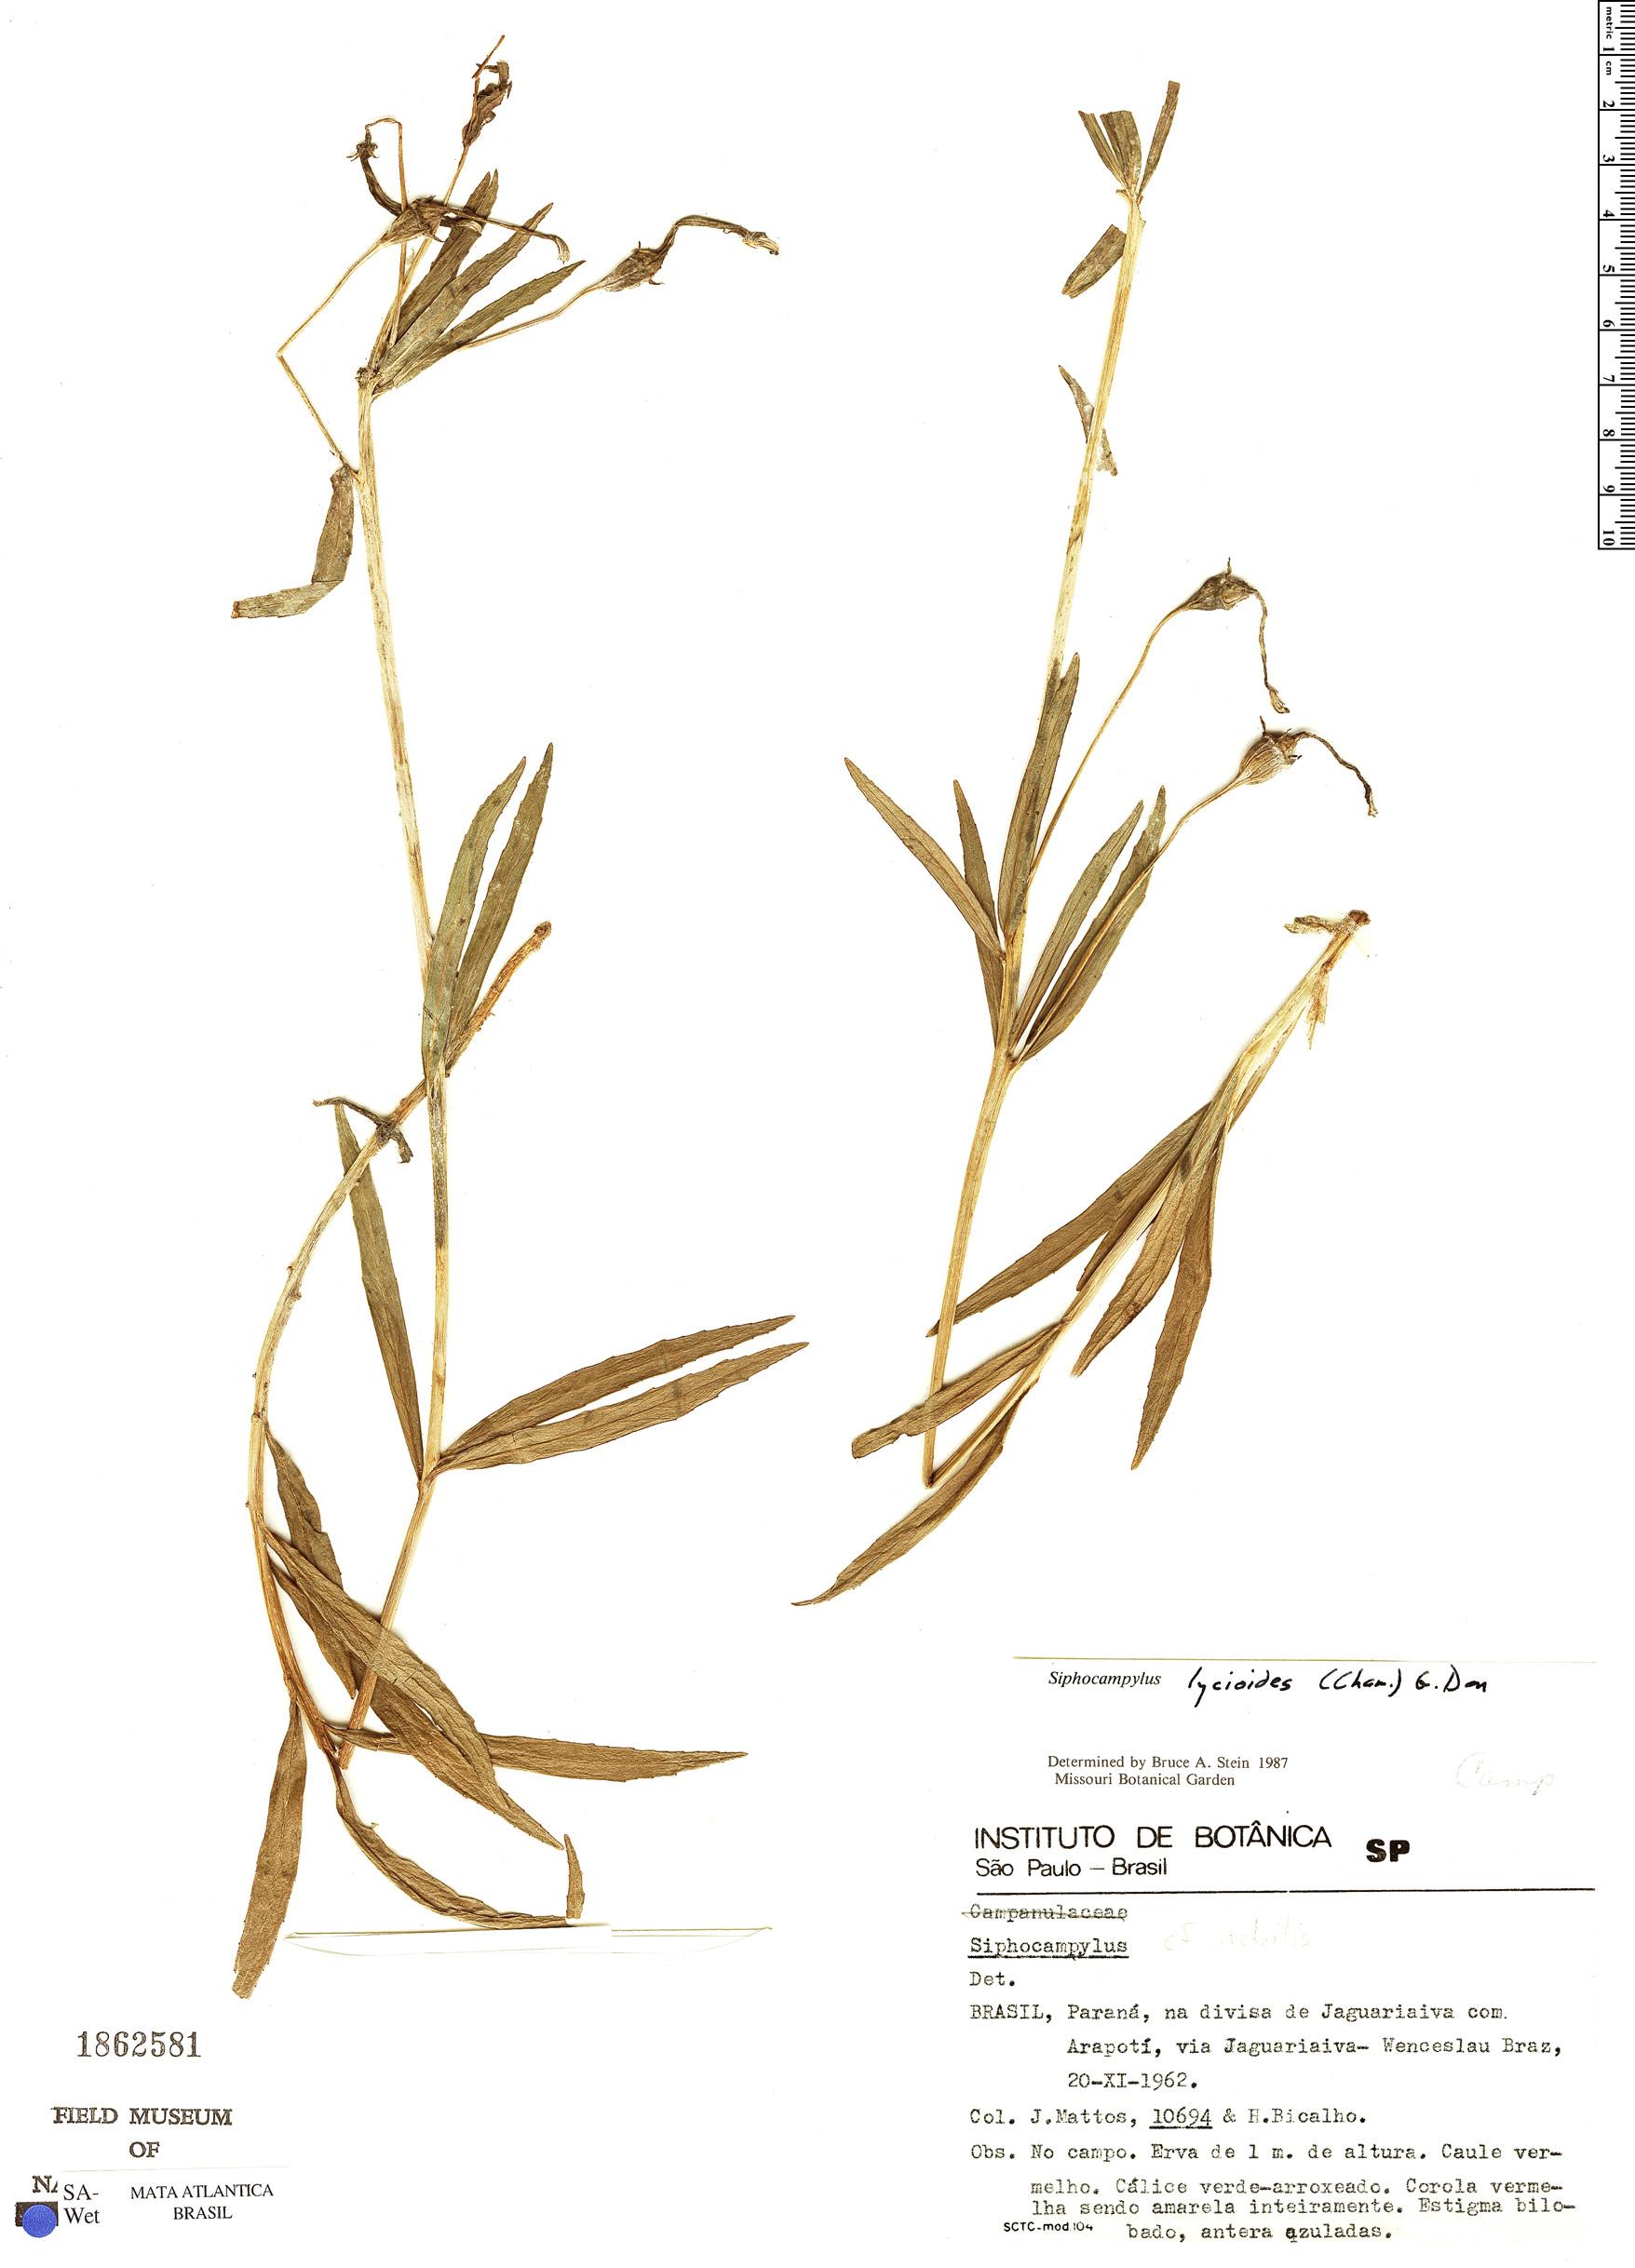 Specimen: Siphocampylus lycioides